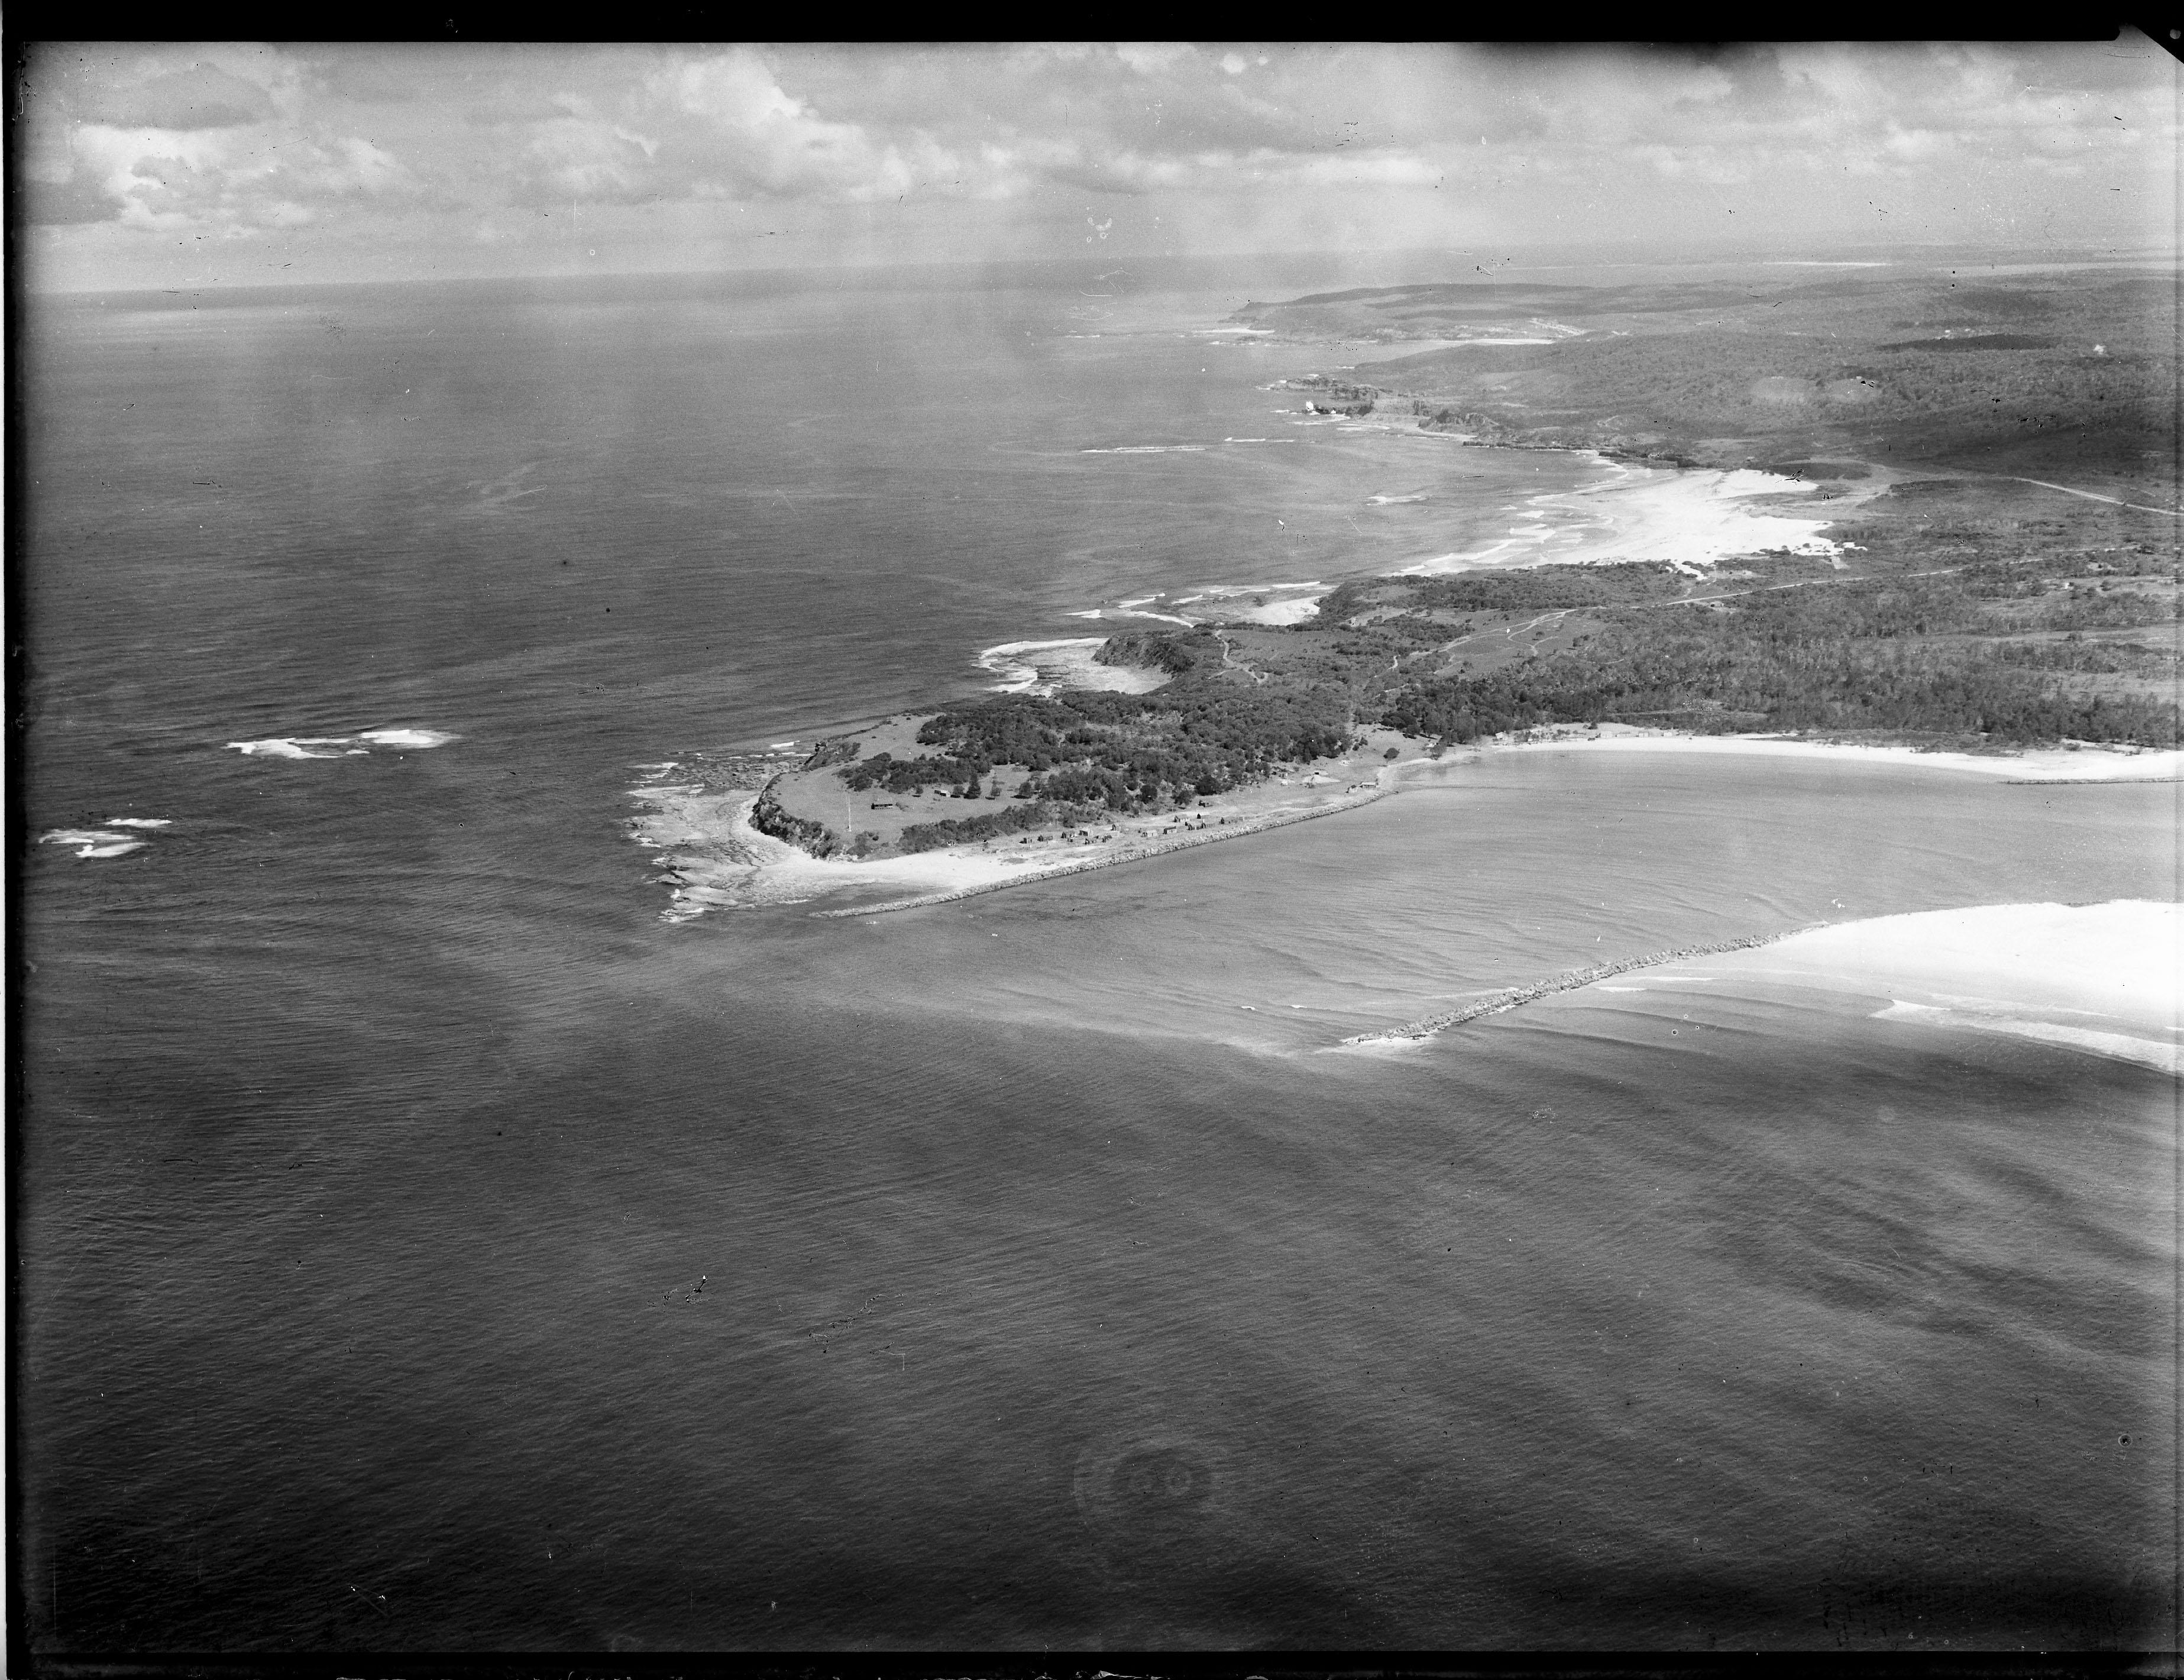 Newcastle aerial, 1935 (Image 72 Courtesy of Phillip Warren)